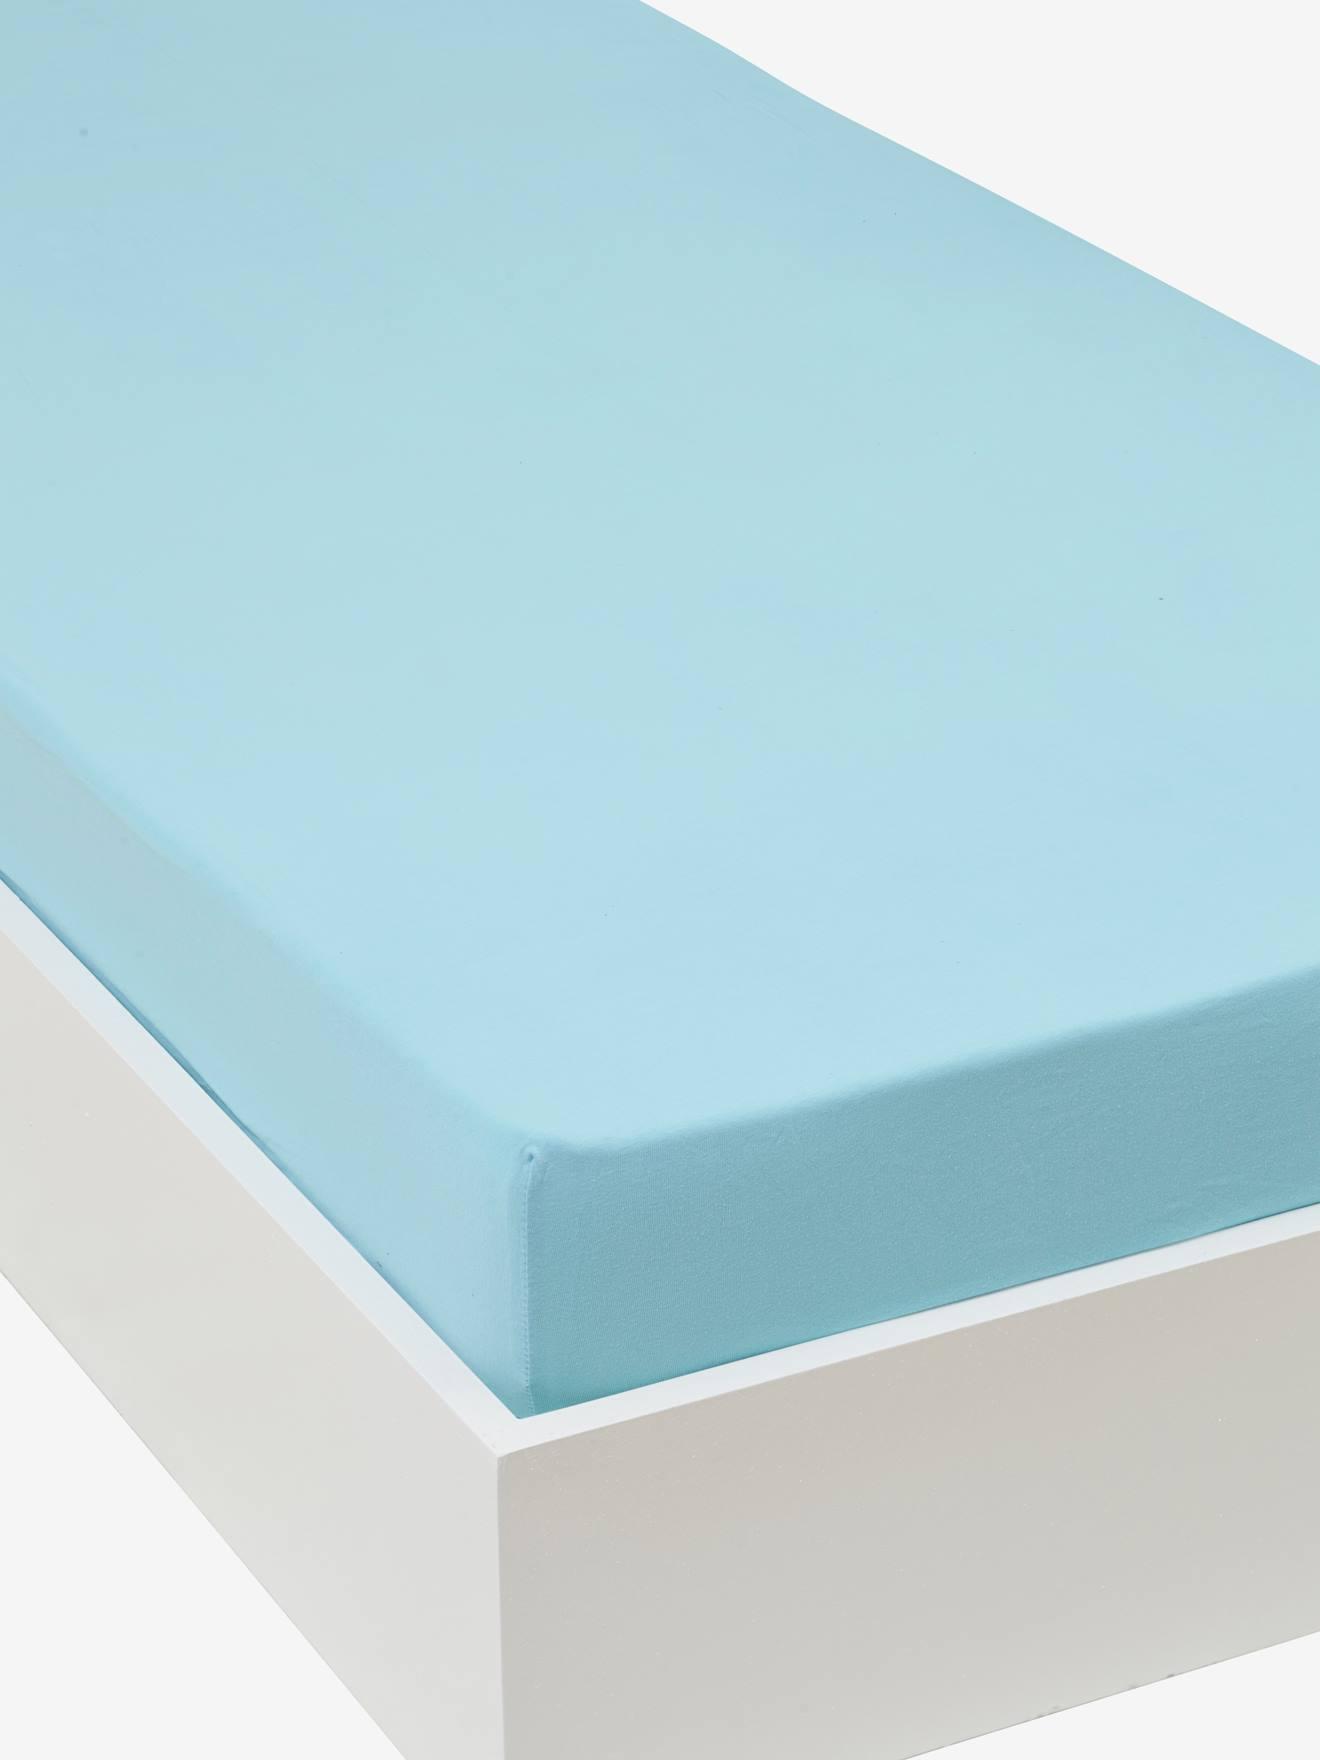 Childrenu0027s Plain Colour Stretch Jersey Knit Fitted Sheet   Blue, Furniture  U0026 Bedding   Vertbaudet